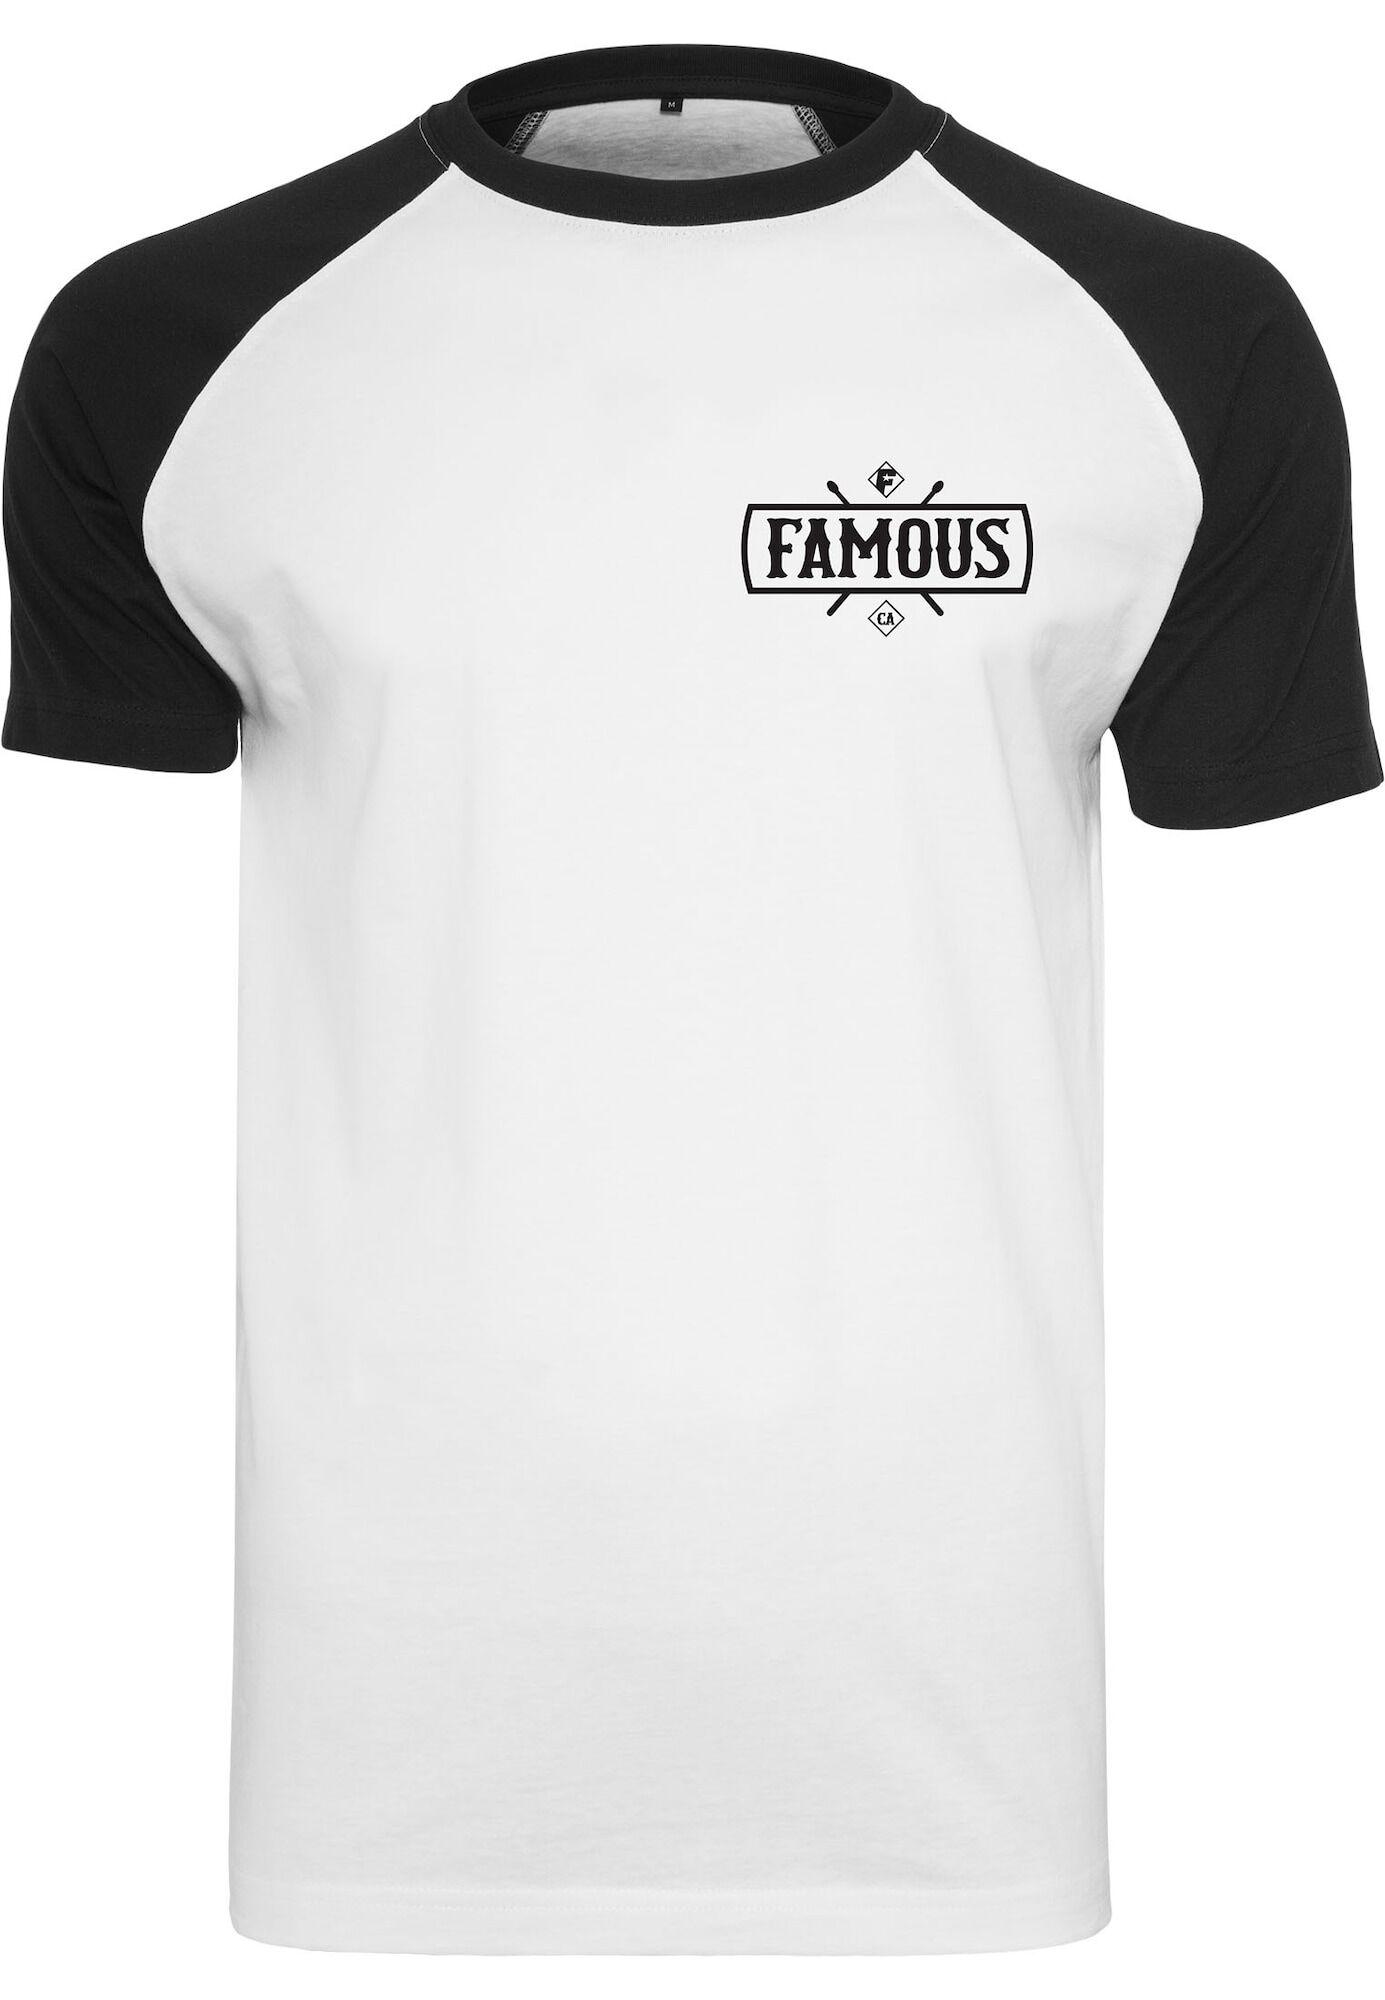 Tee T-Shirt 'Chaos'  - Blanc - Taille: XXL - male